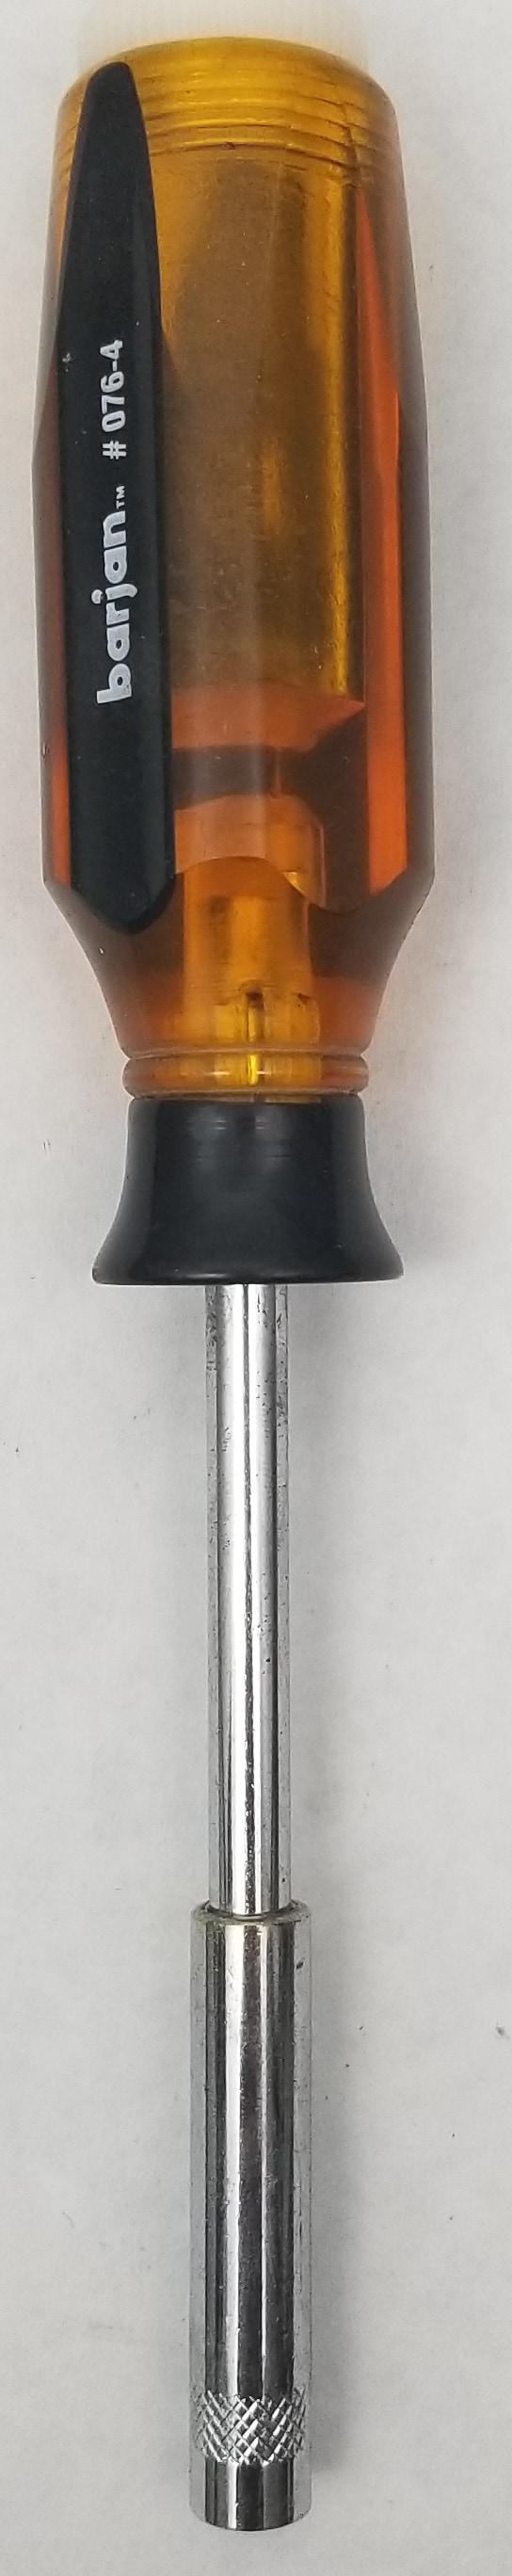 0764 - Torx Style Screwdriver w/4 Tips